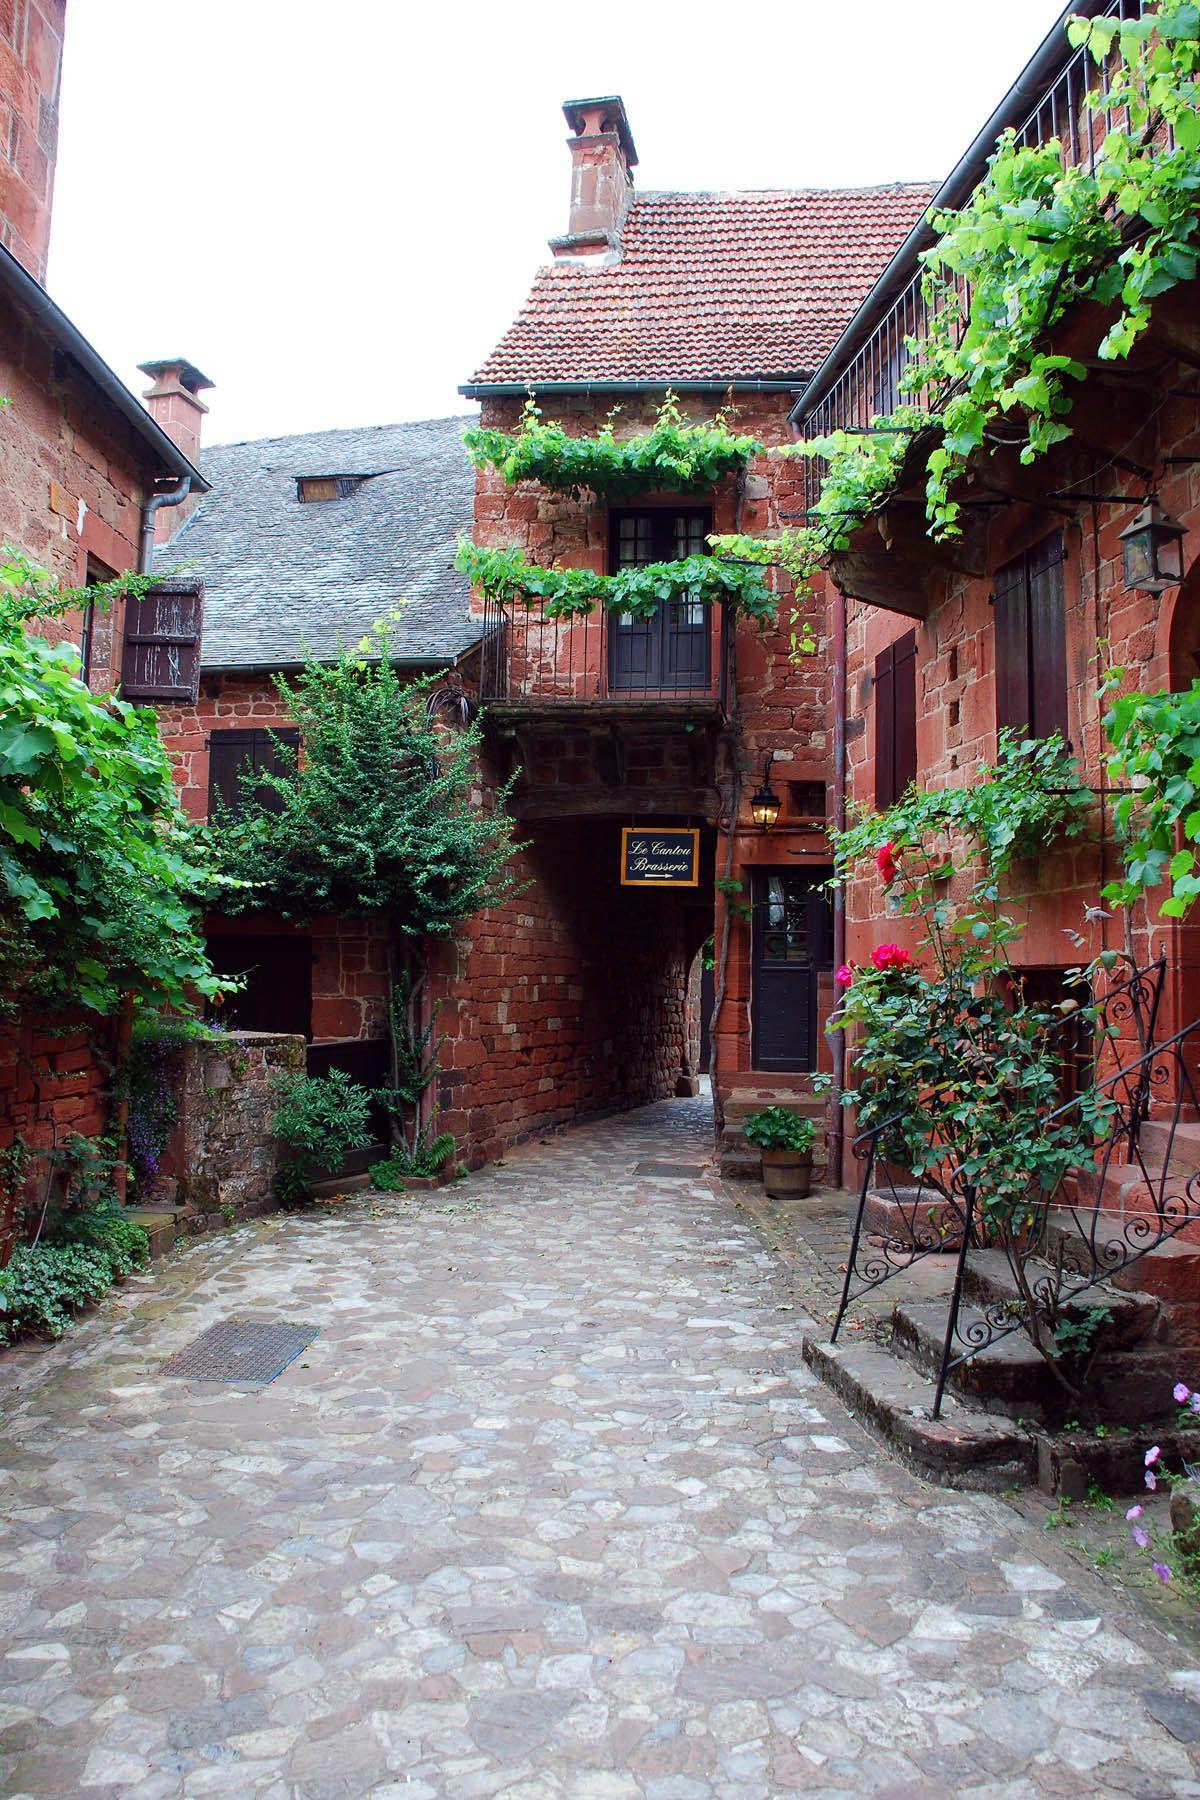 Photo Collonges La Rouge France France Photos Places Around The World Beautiful Buildings